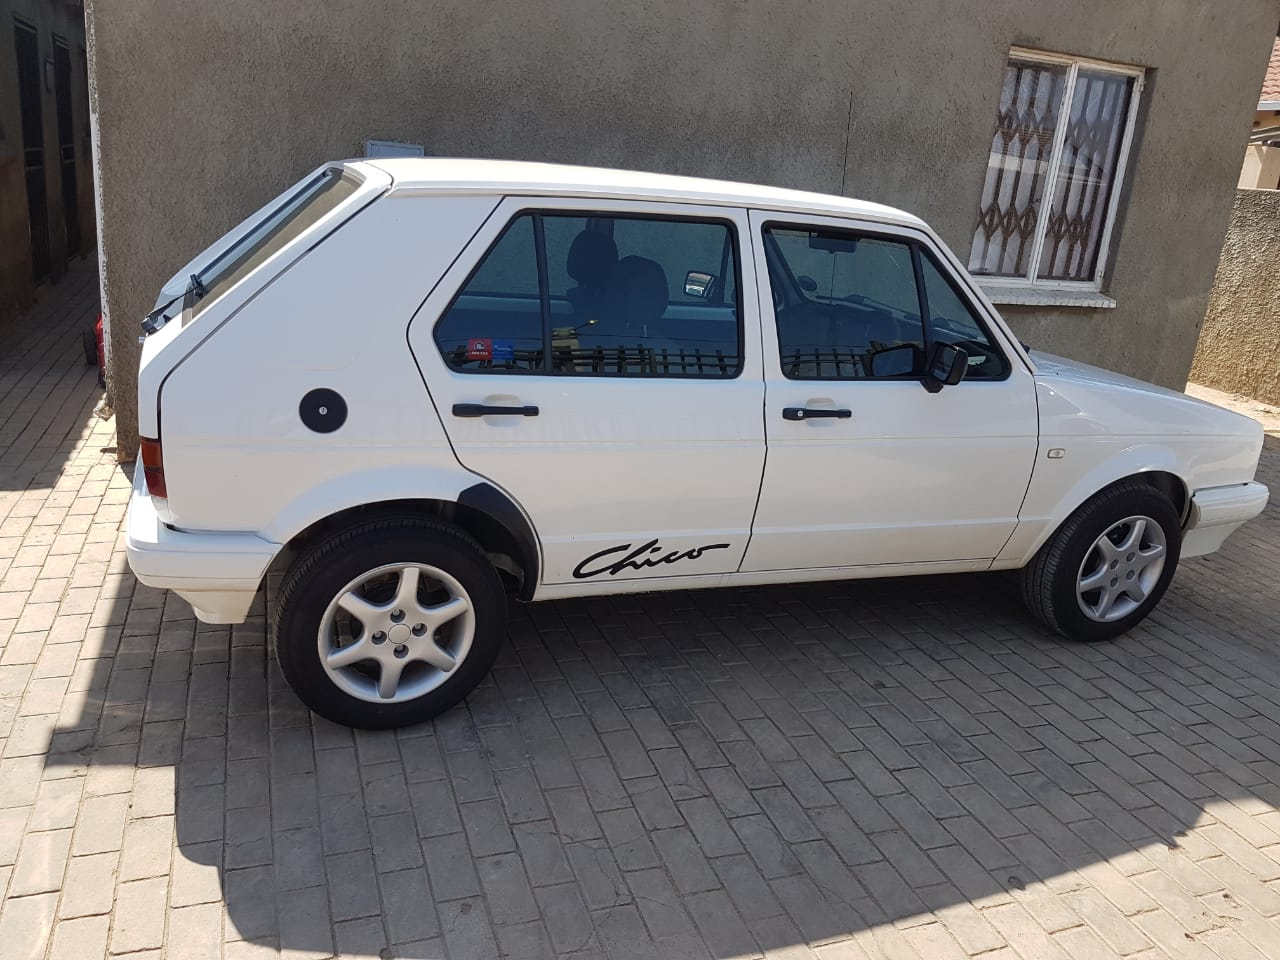 2003 Volkswagen citi14 carb